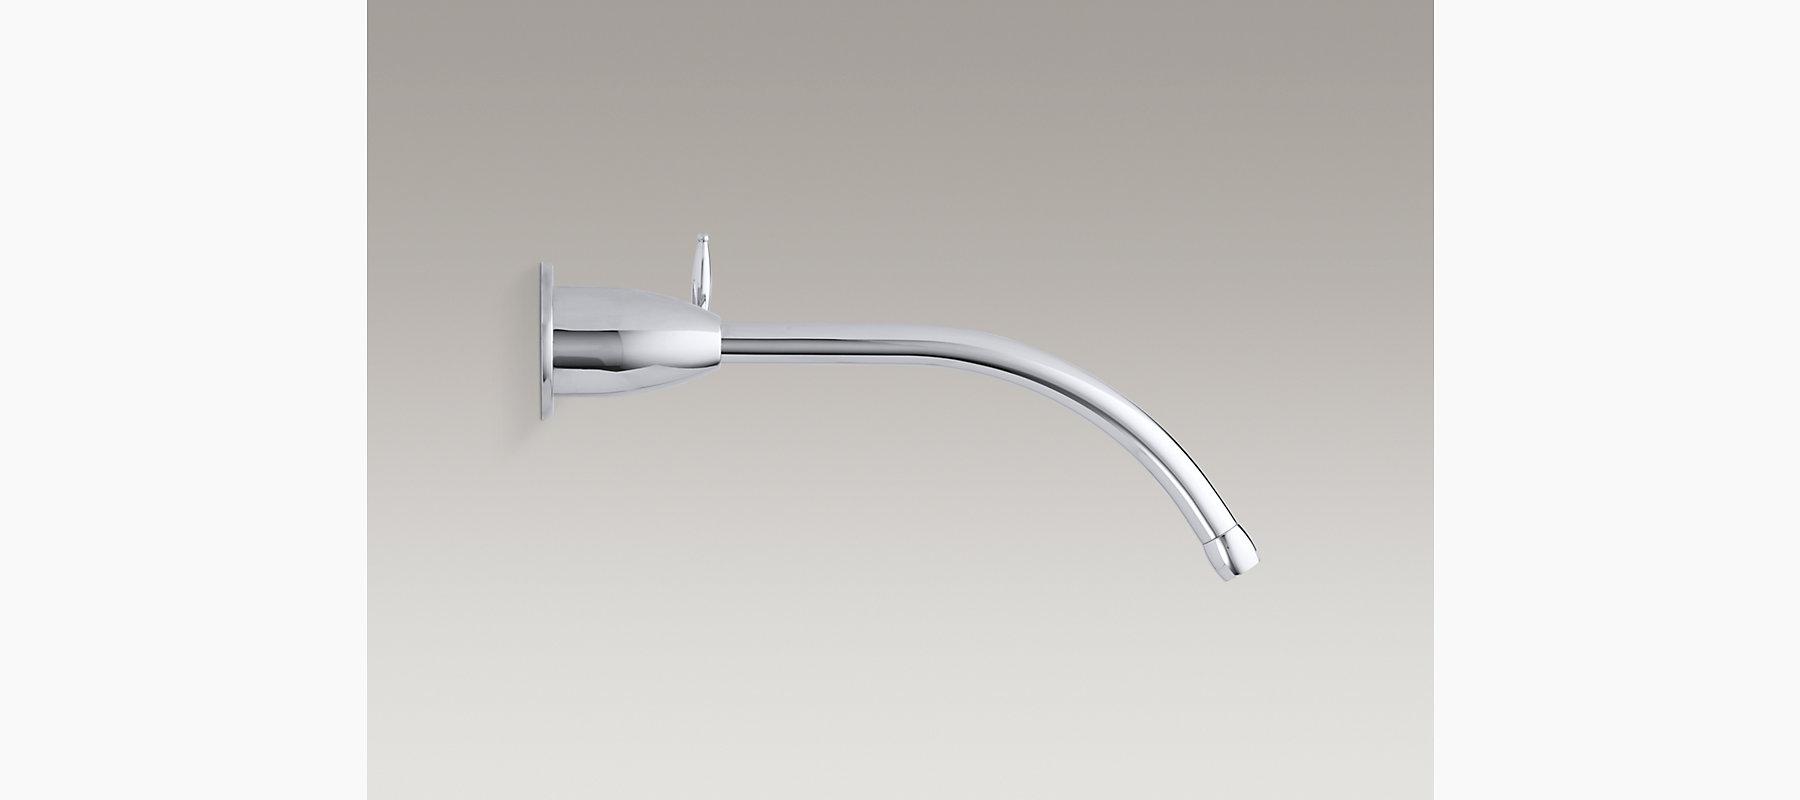 Falling Water Wall-Mount Bathroom Sink Faucet Trim | K-T198 | KOHLER